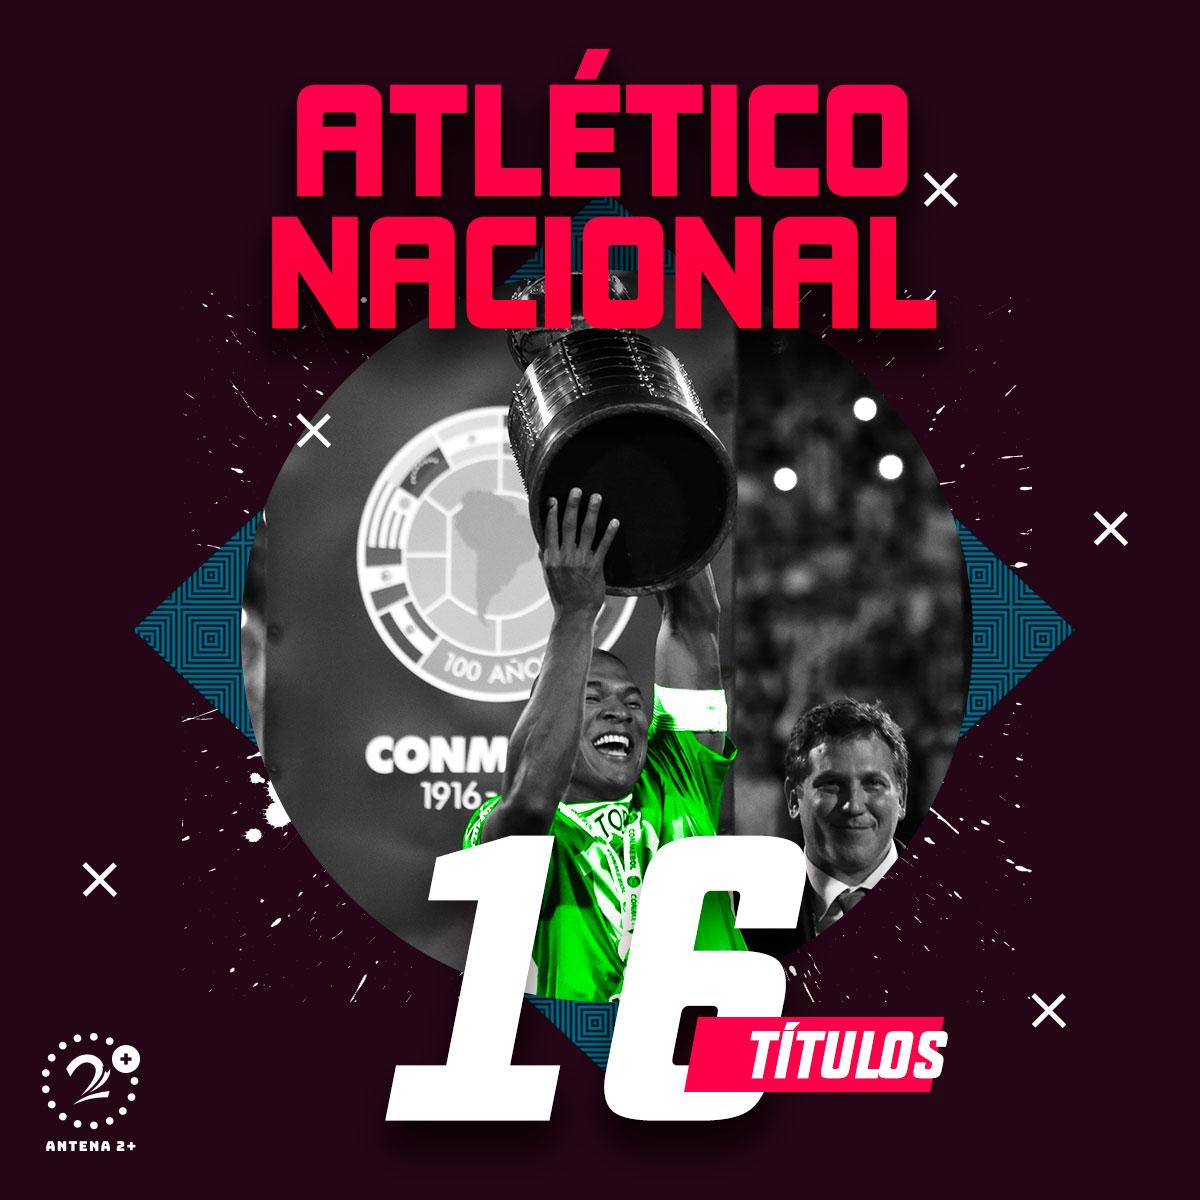 Atlético Nacional - 16